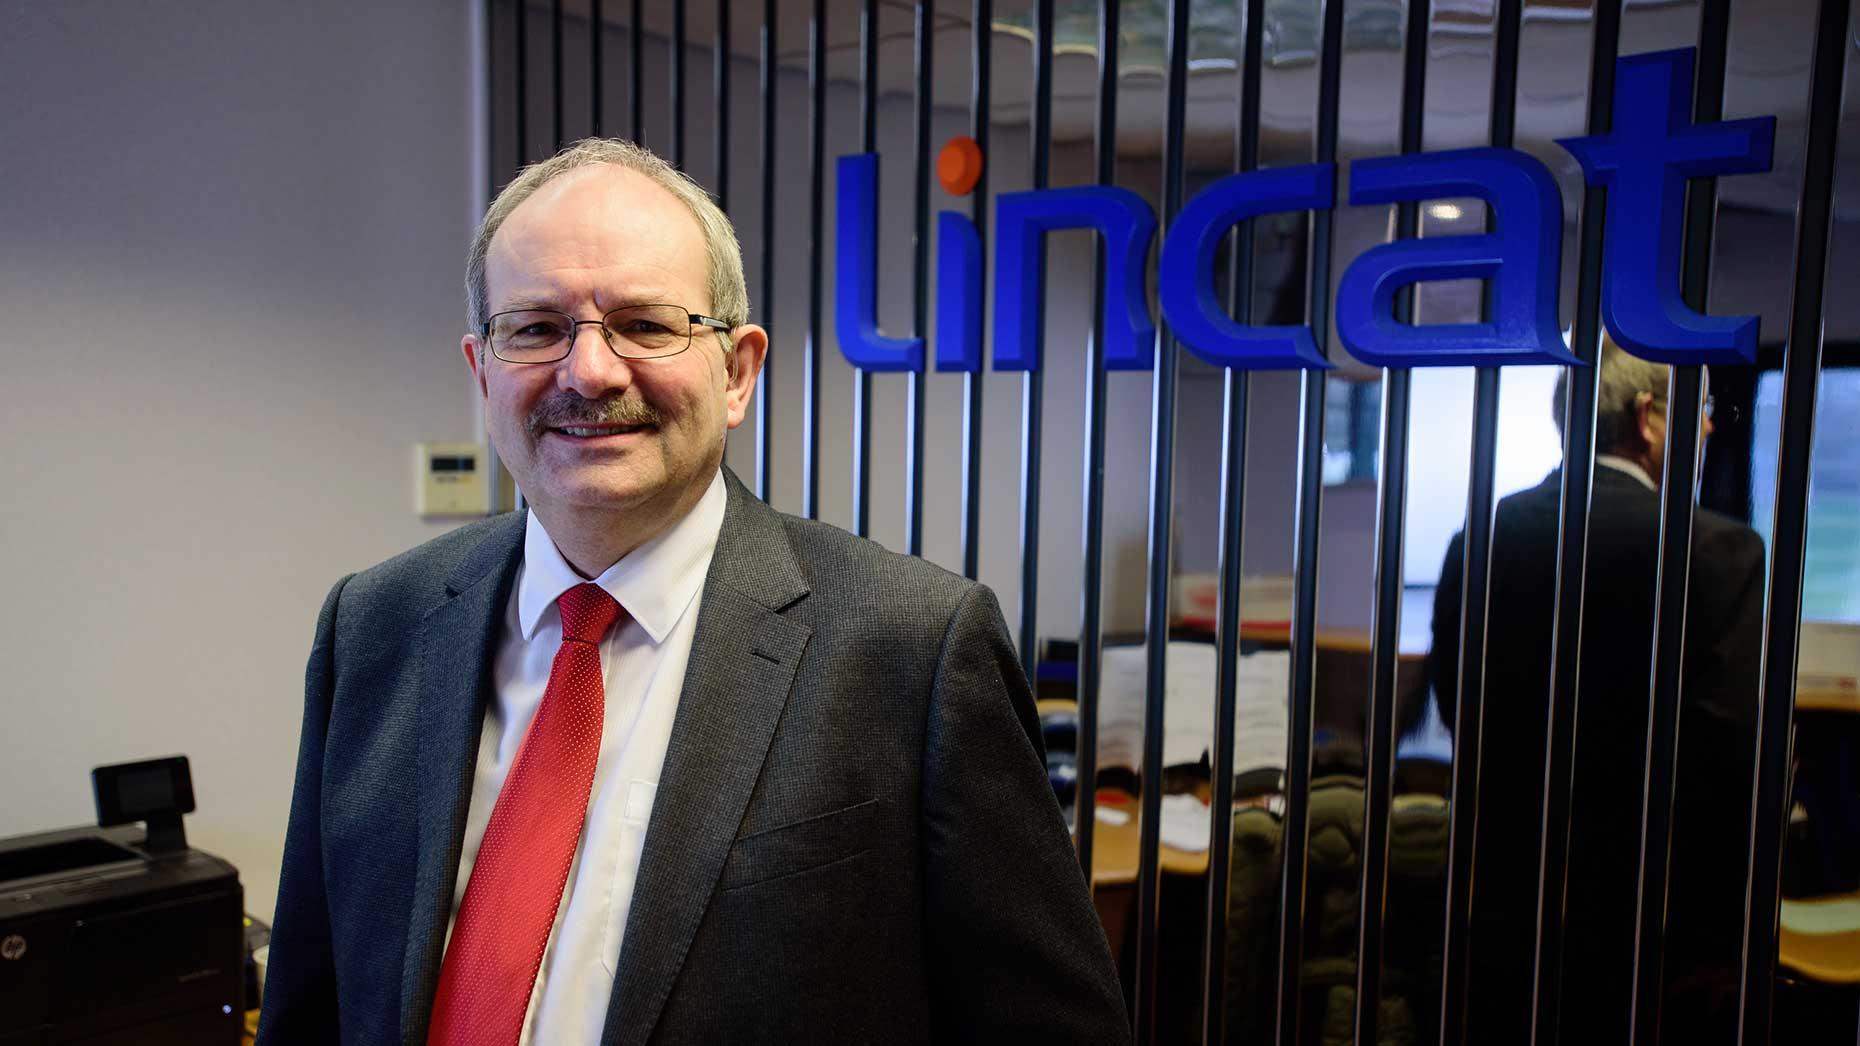 Nick McDonald, managing director of Lincat Ltd